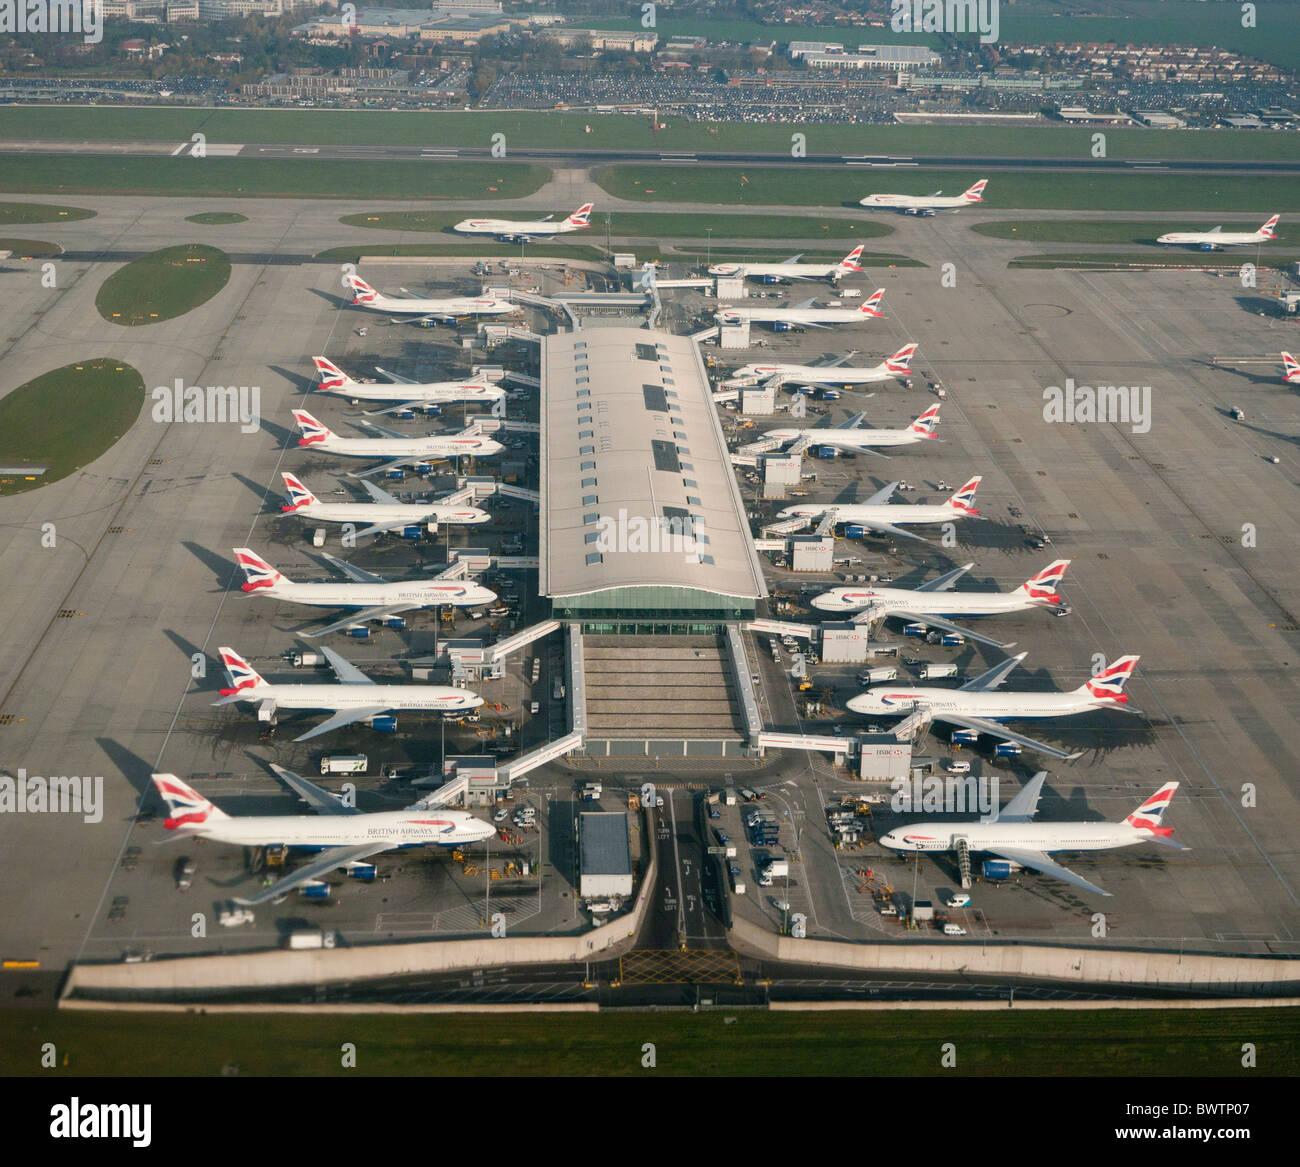 British airways planes at Terminal 5 Heathrow airport in Britain - Stock Image